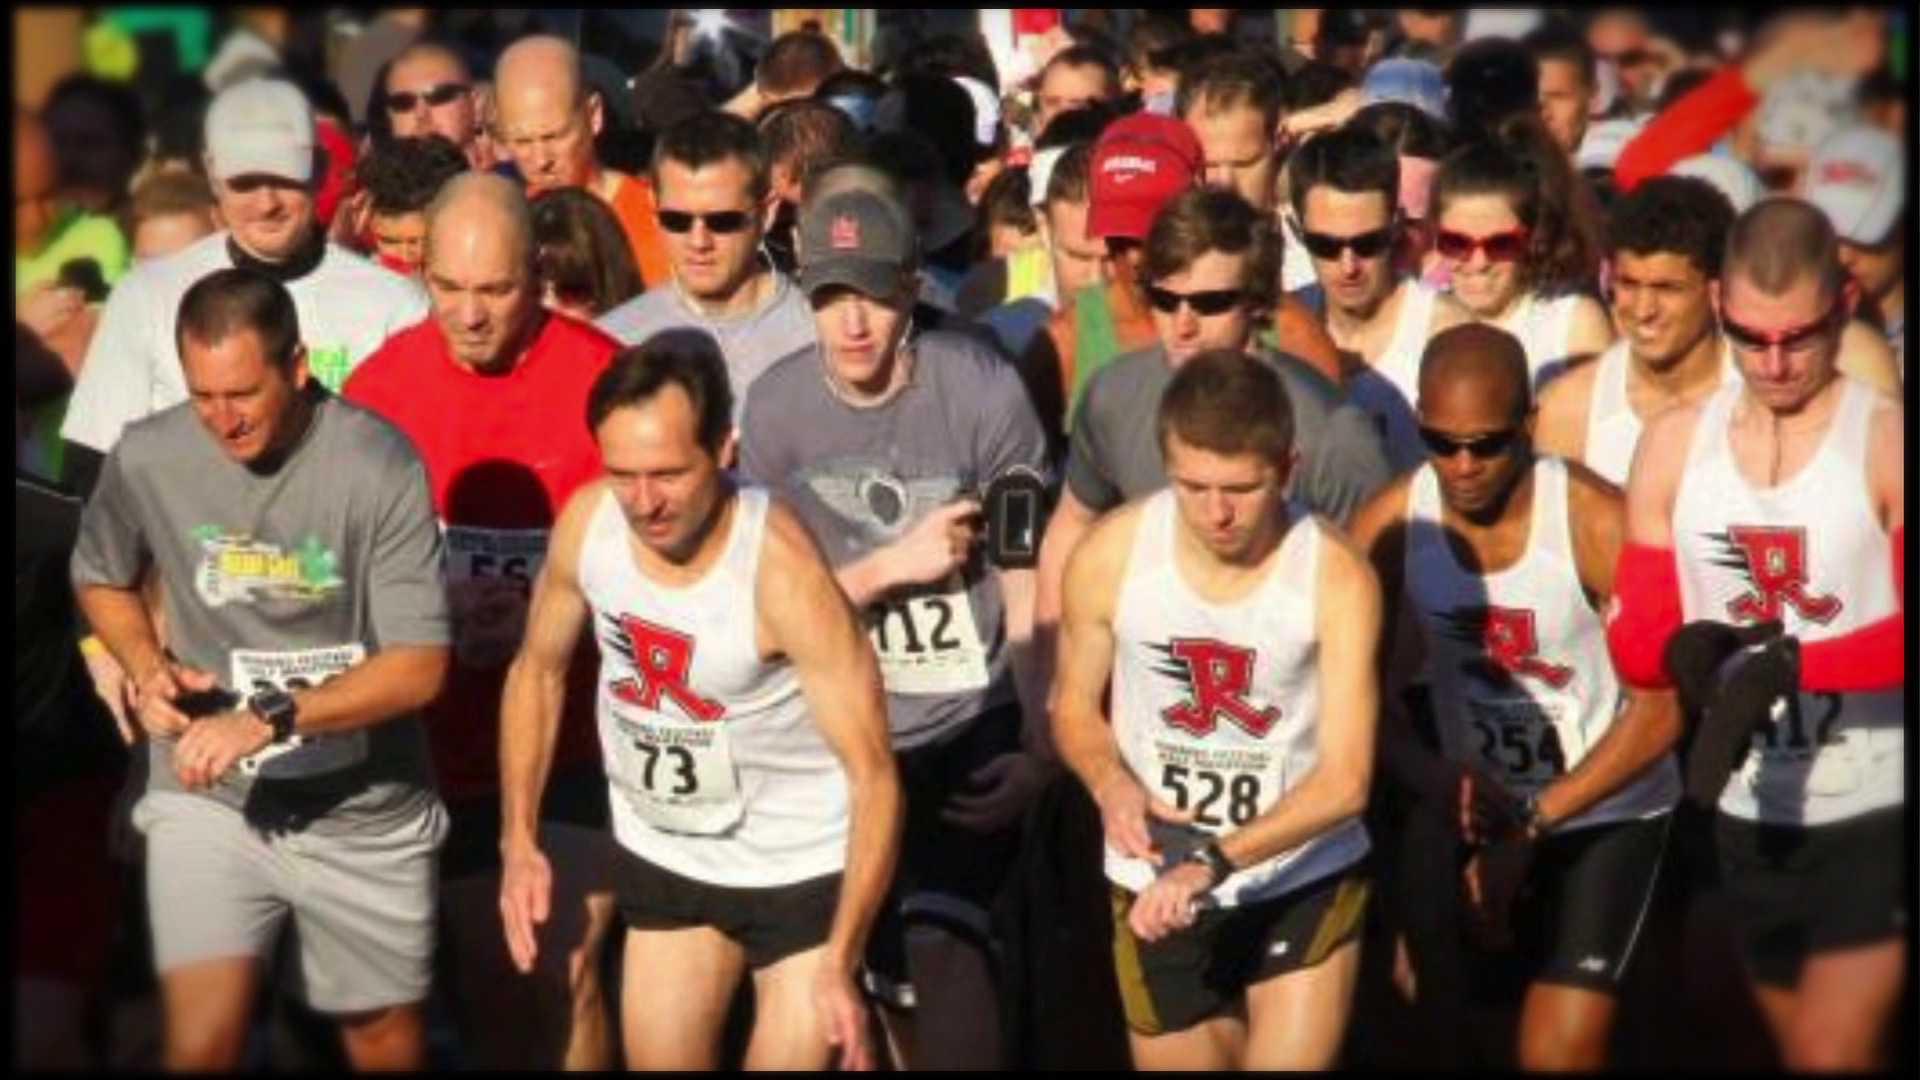 runningfestival